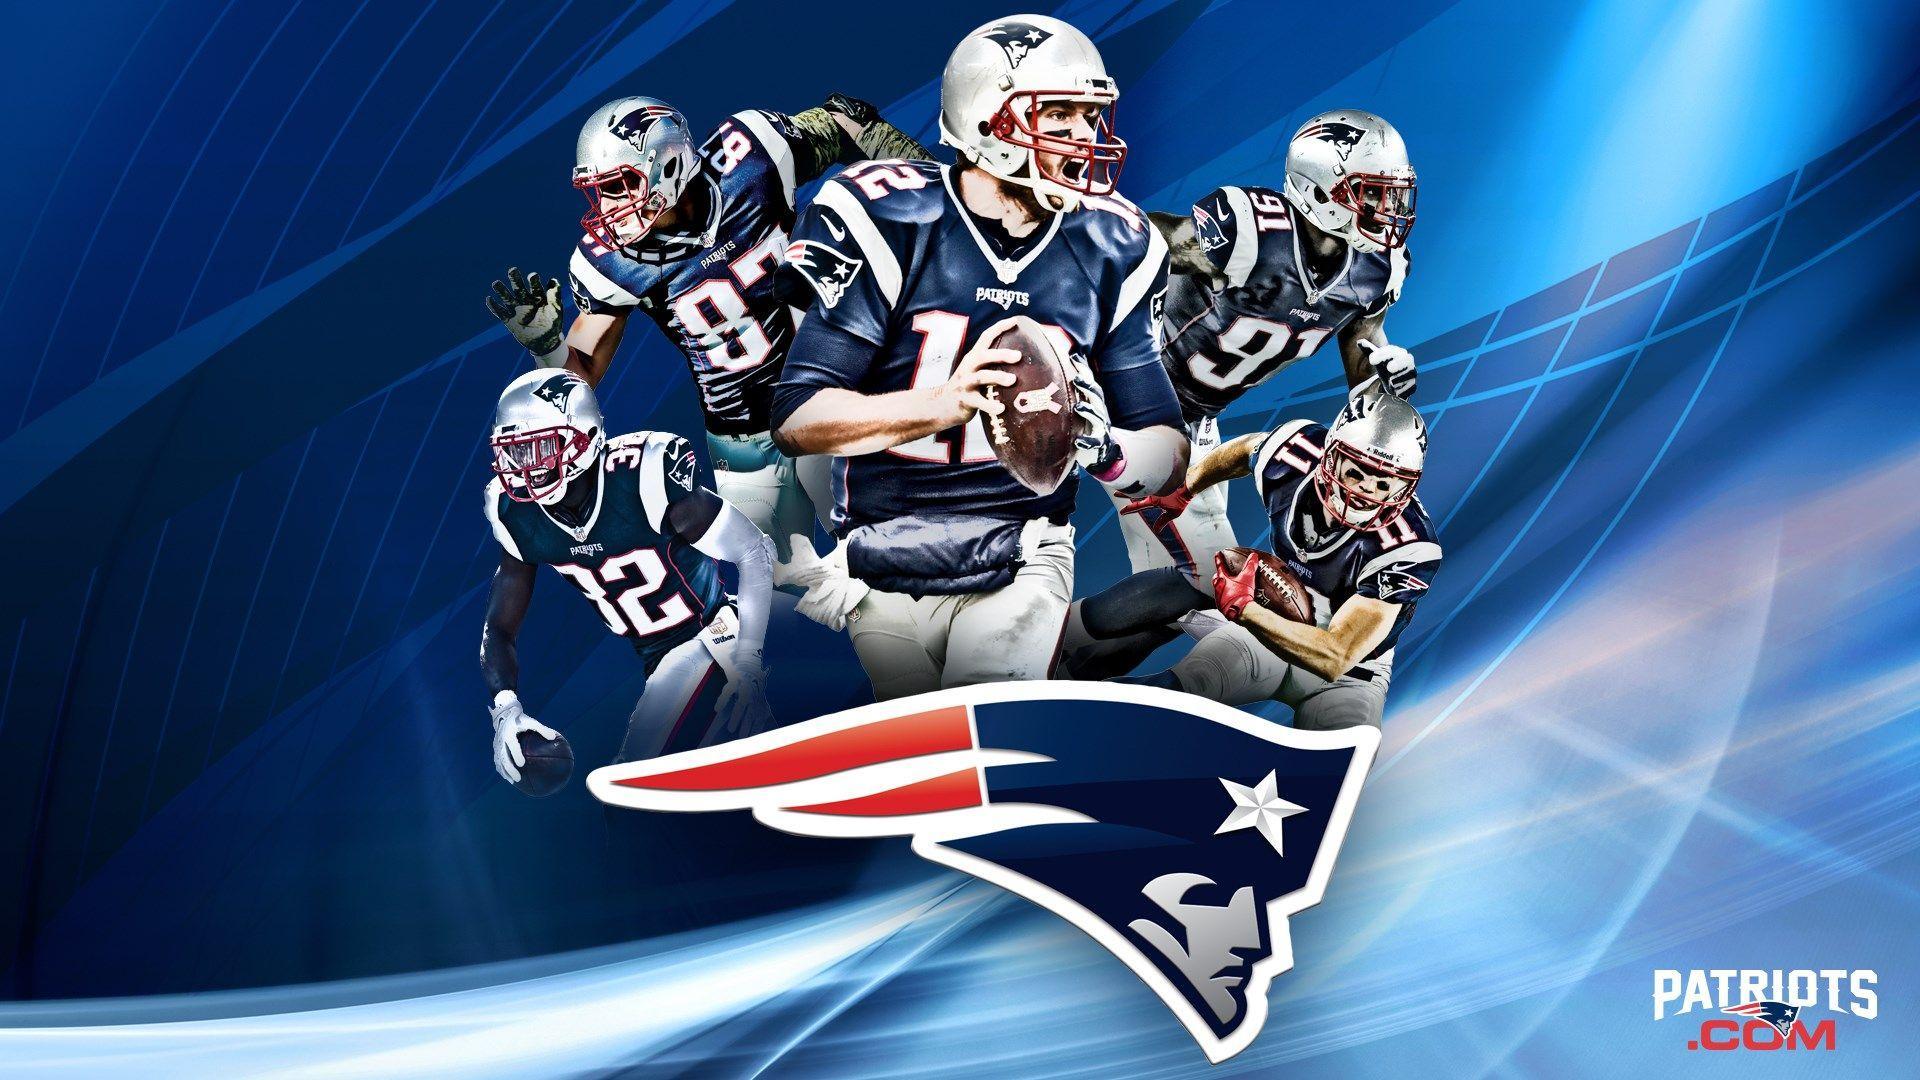 Patriots Football Wallpapers - Top Free